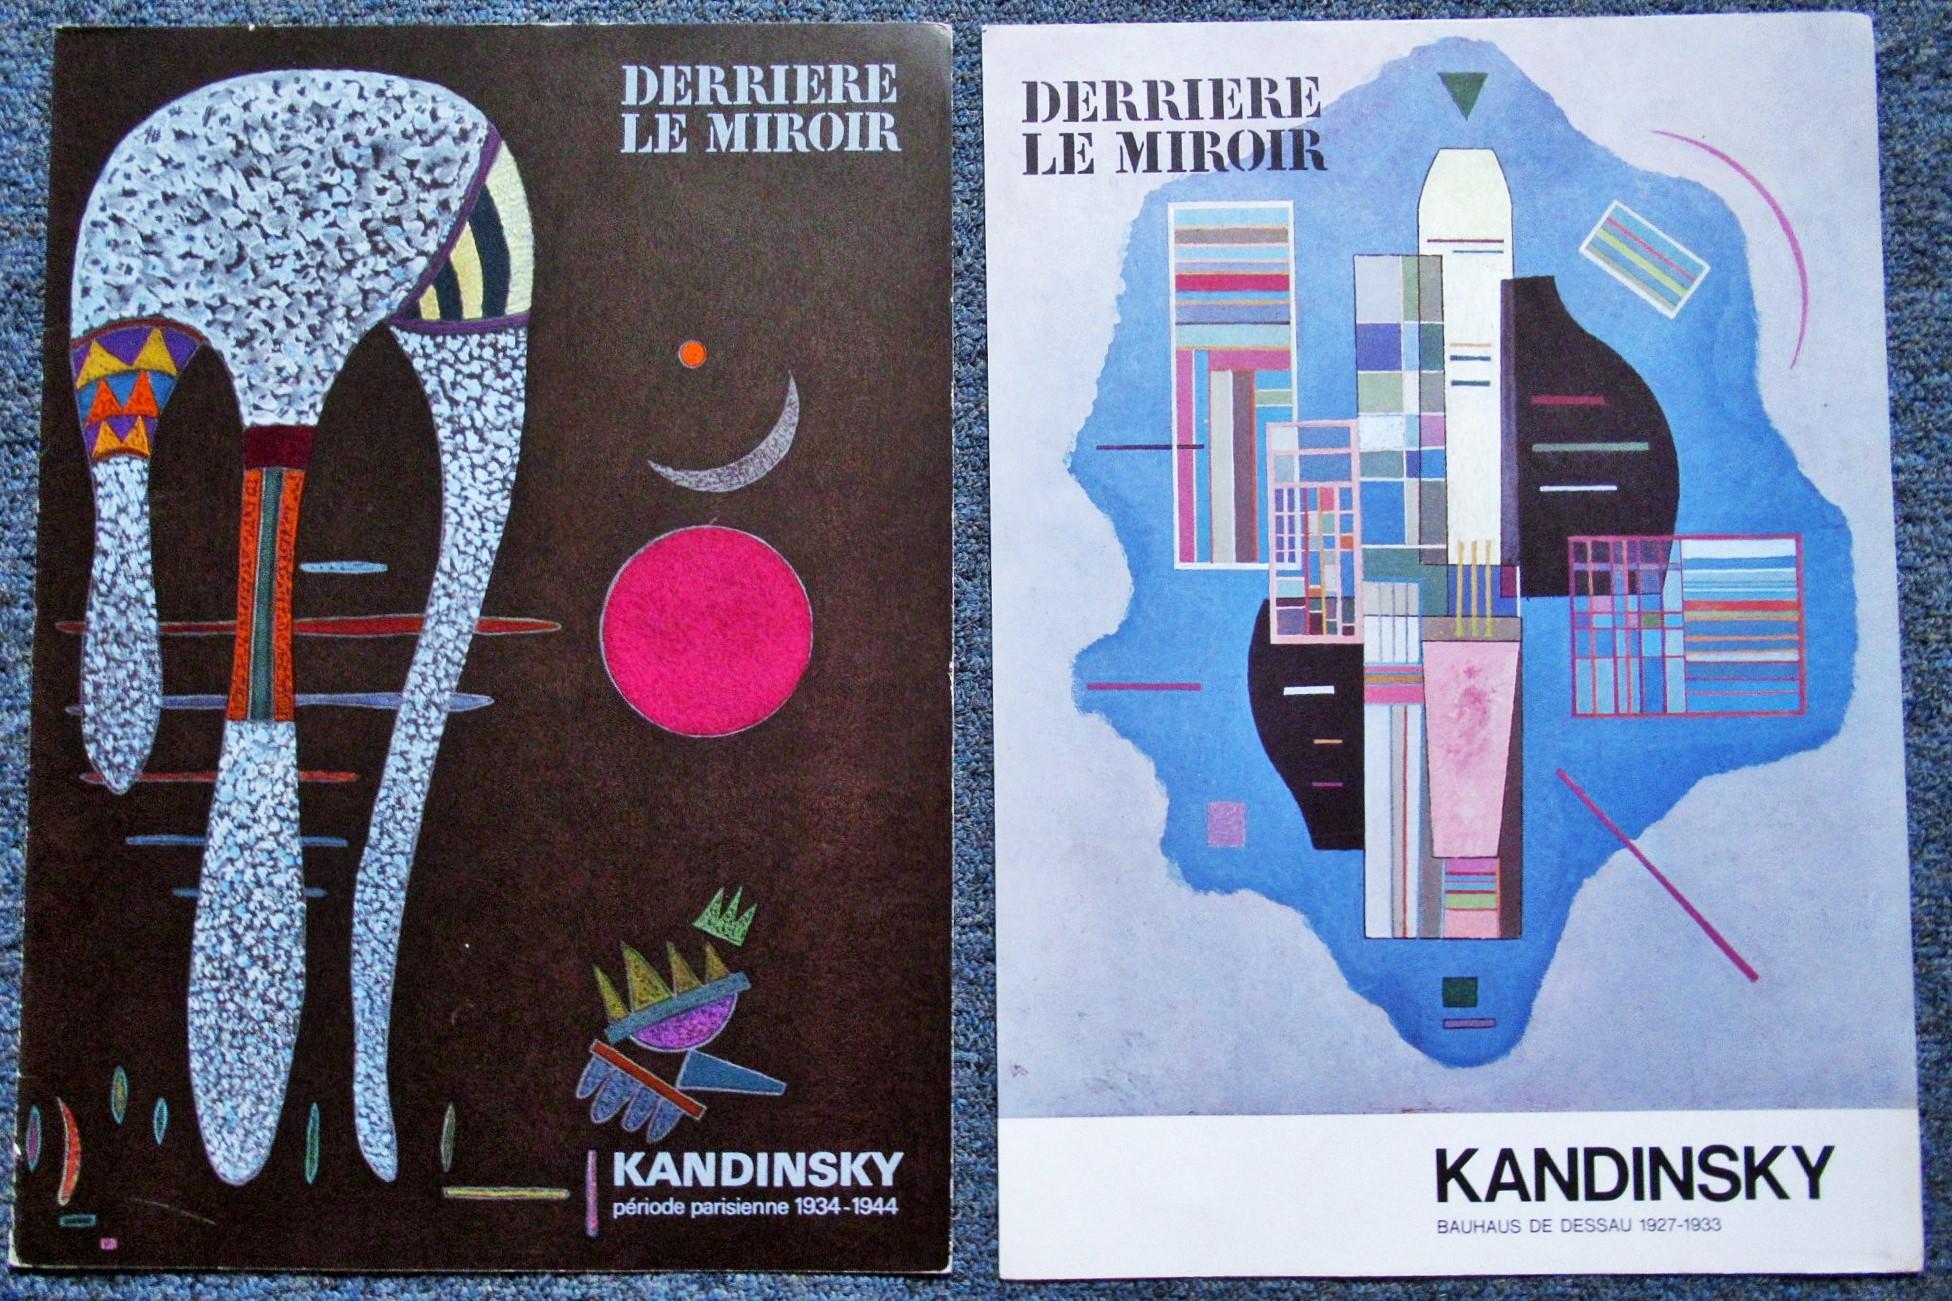 TWO_2_ORIGINAL_LITHOGRAPHS_BY_KANDINSKY_KANDINSKY_Very_Good